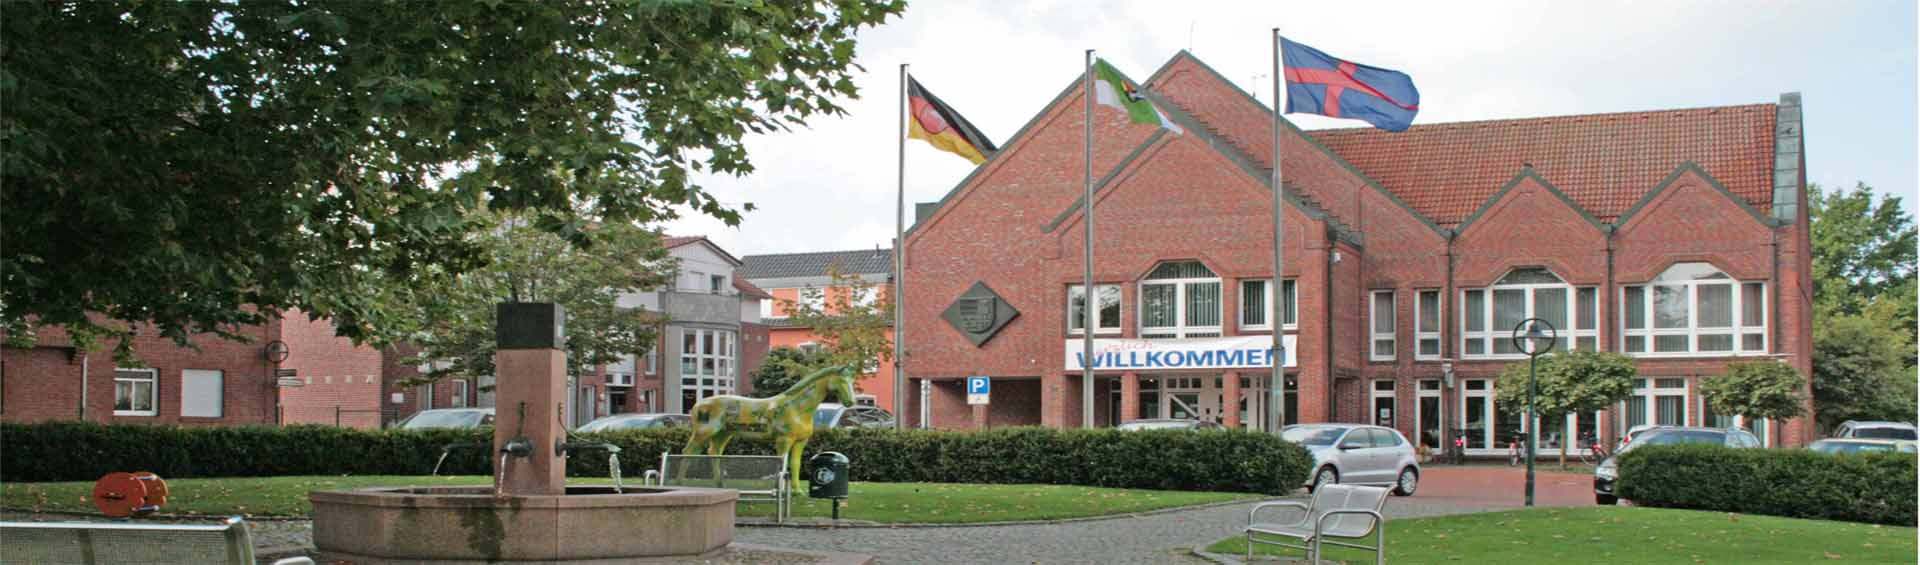 Steinfeld Banner 6 - Rathaus